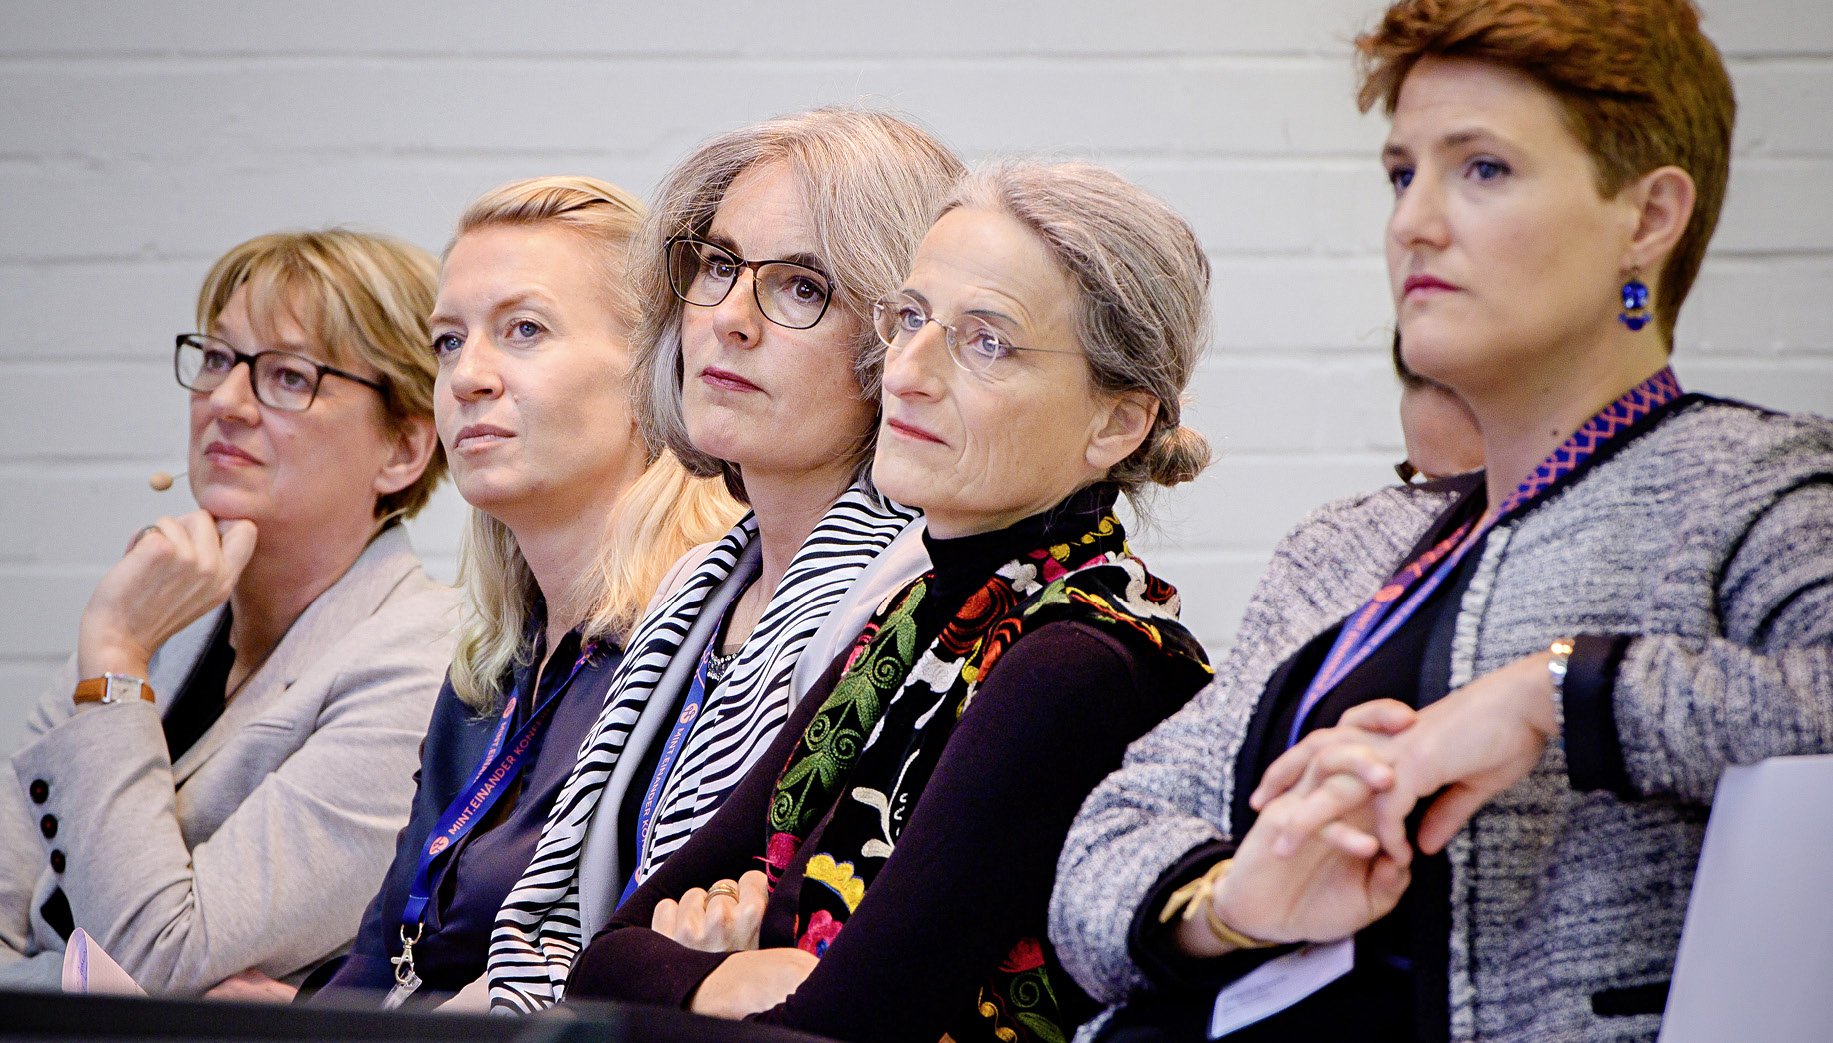 Führungsfrauen der Bahnbranche: Magali Euverte (Keolis), Traude Kogoj (ÖBB), Susanne Henckel (VBB), Michaela Kay (Bombardier), Moderatorin Schulte-Loh